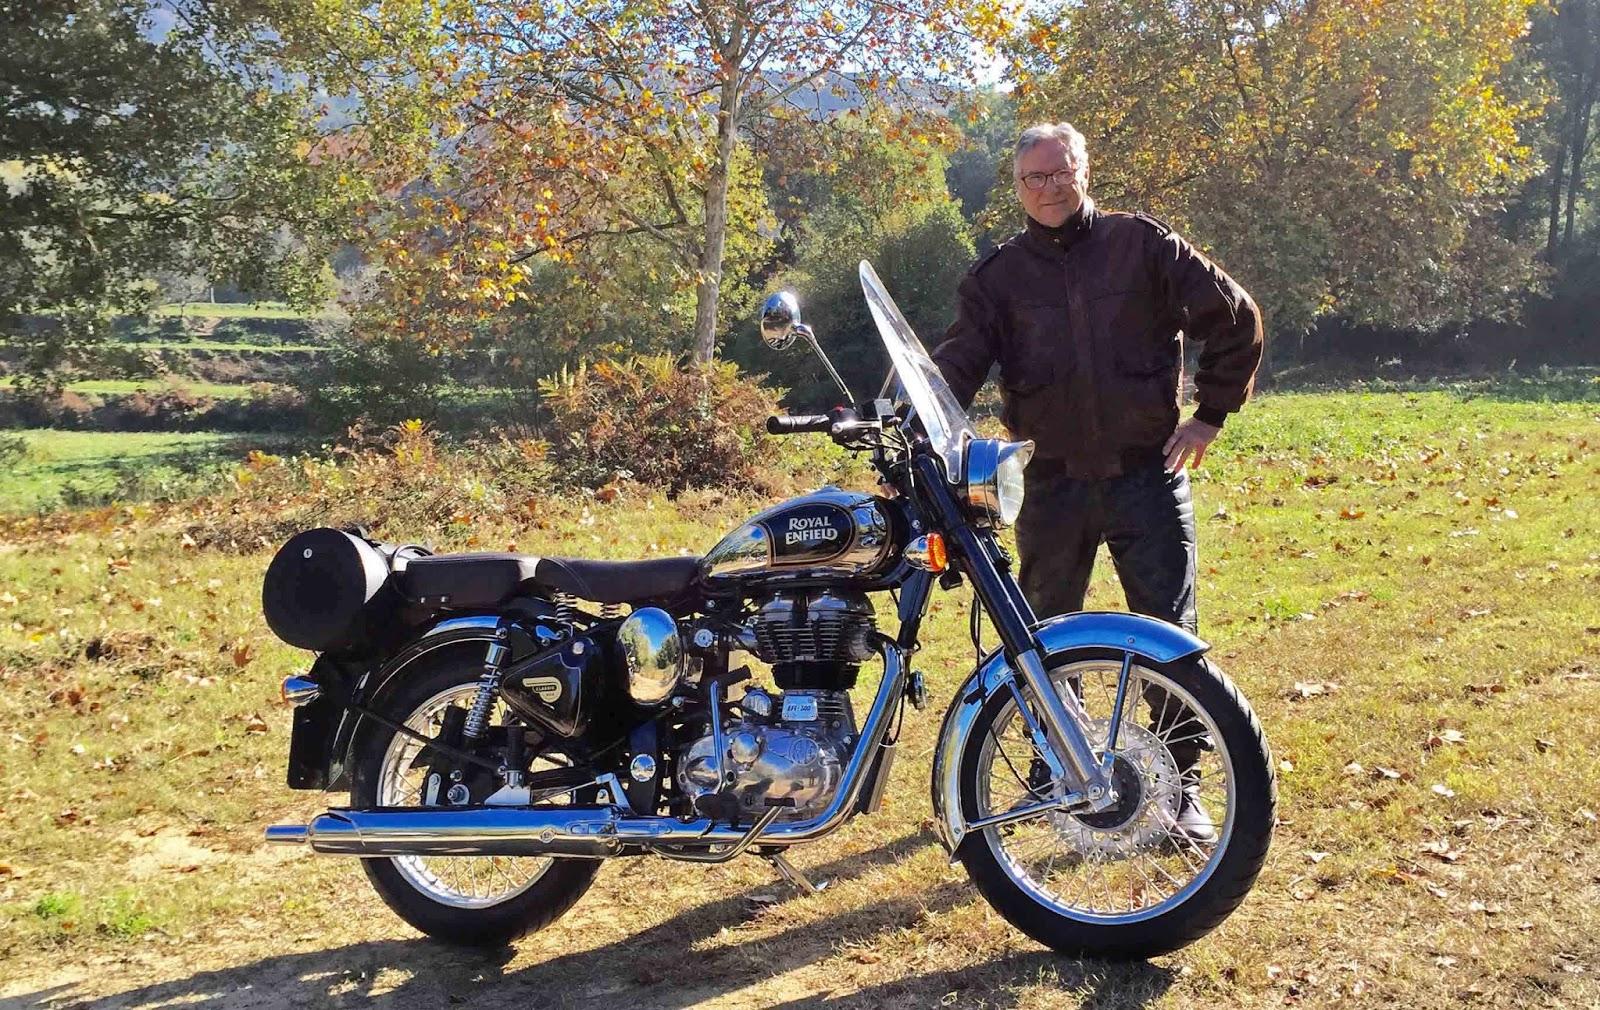 Blog De Jose Maria Alguersuari La Moto Mejor Del Mundo Si Tú